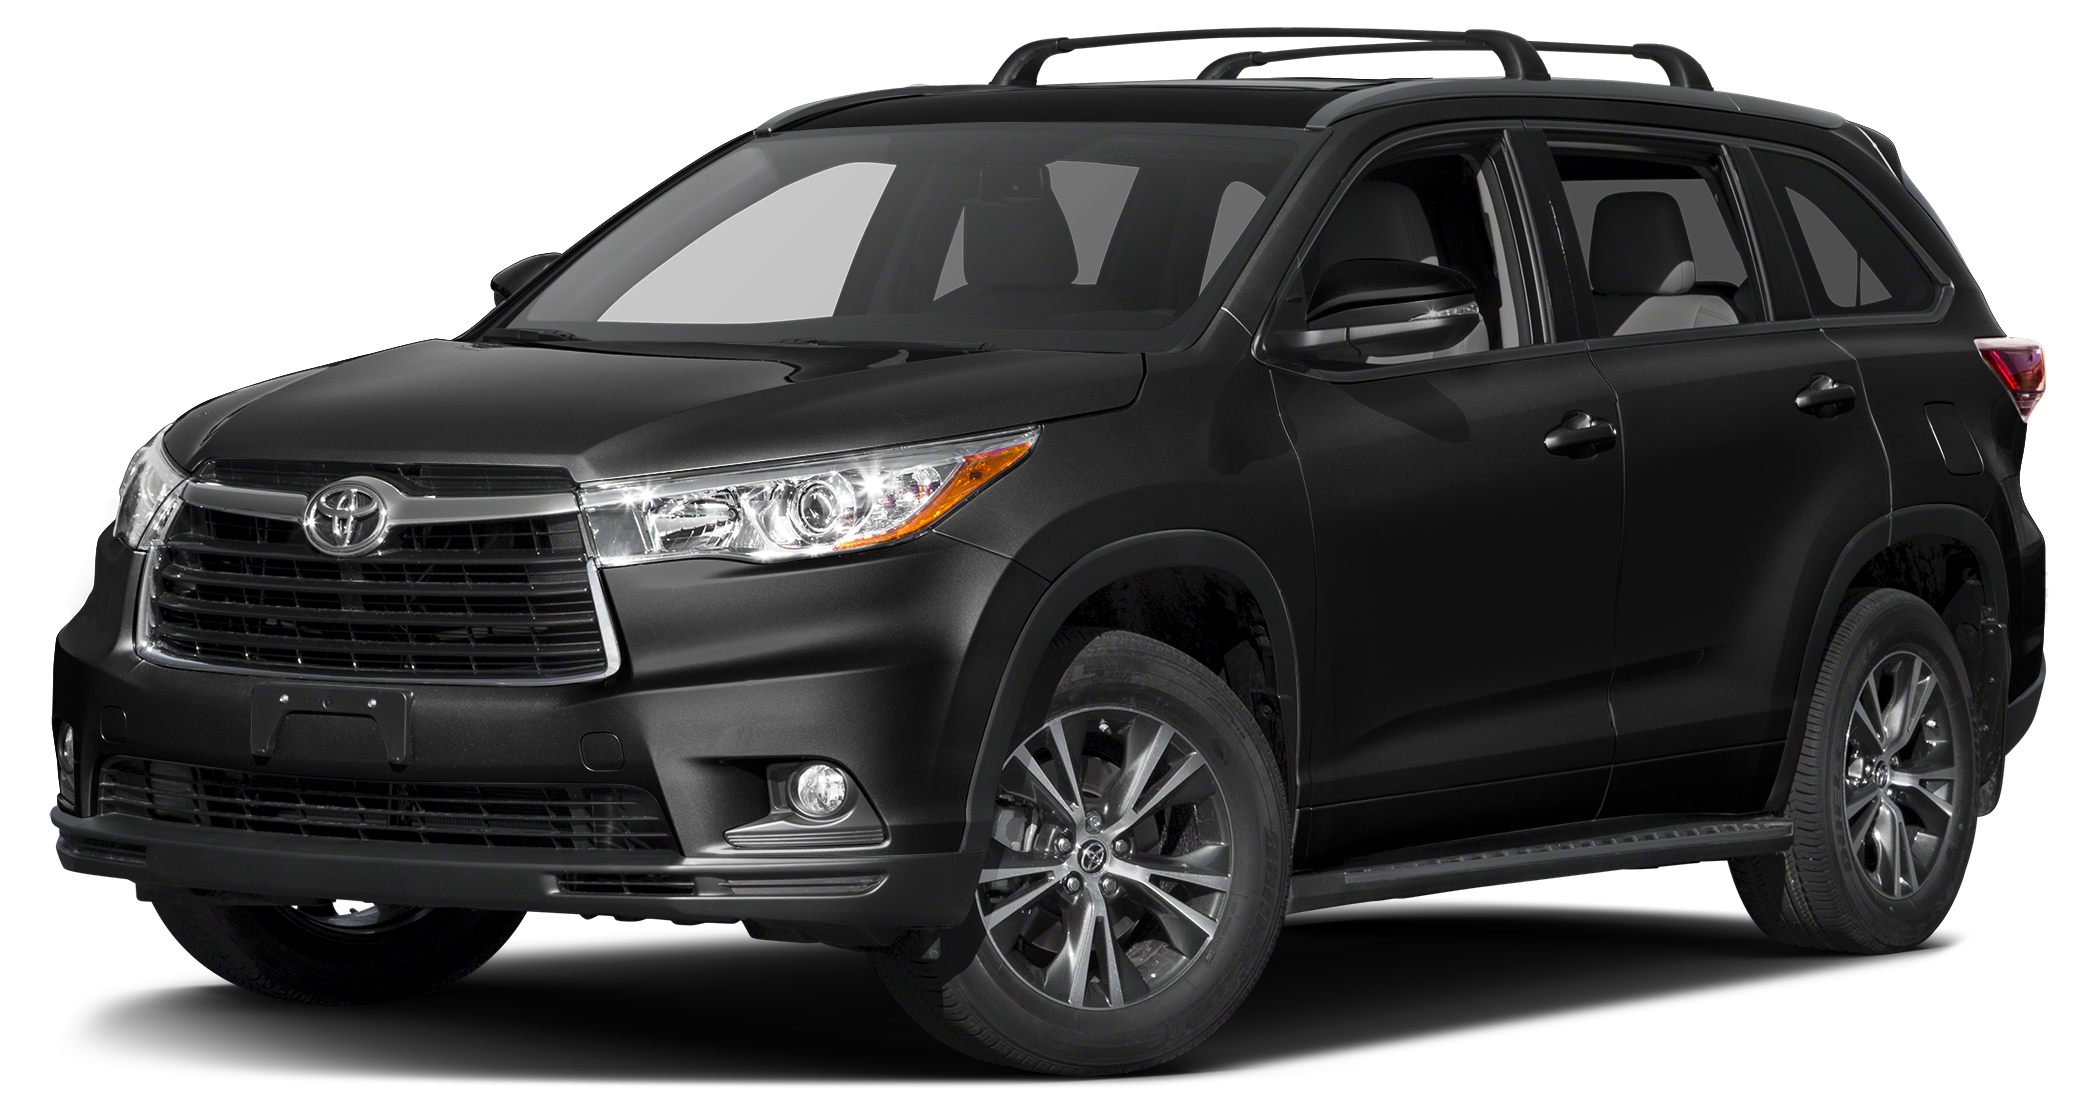 2016 Toyota Highlander XLE Miles 0Color Midnight Black Metallic Stock 01339 VIN 5TDKKRFH6GS5